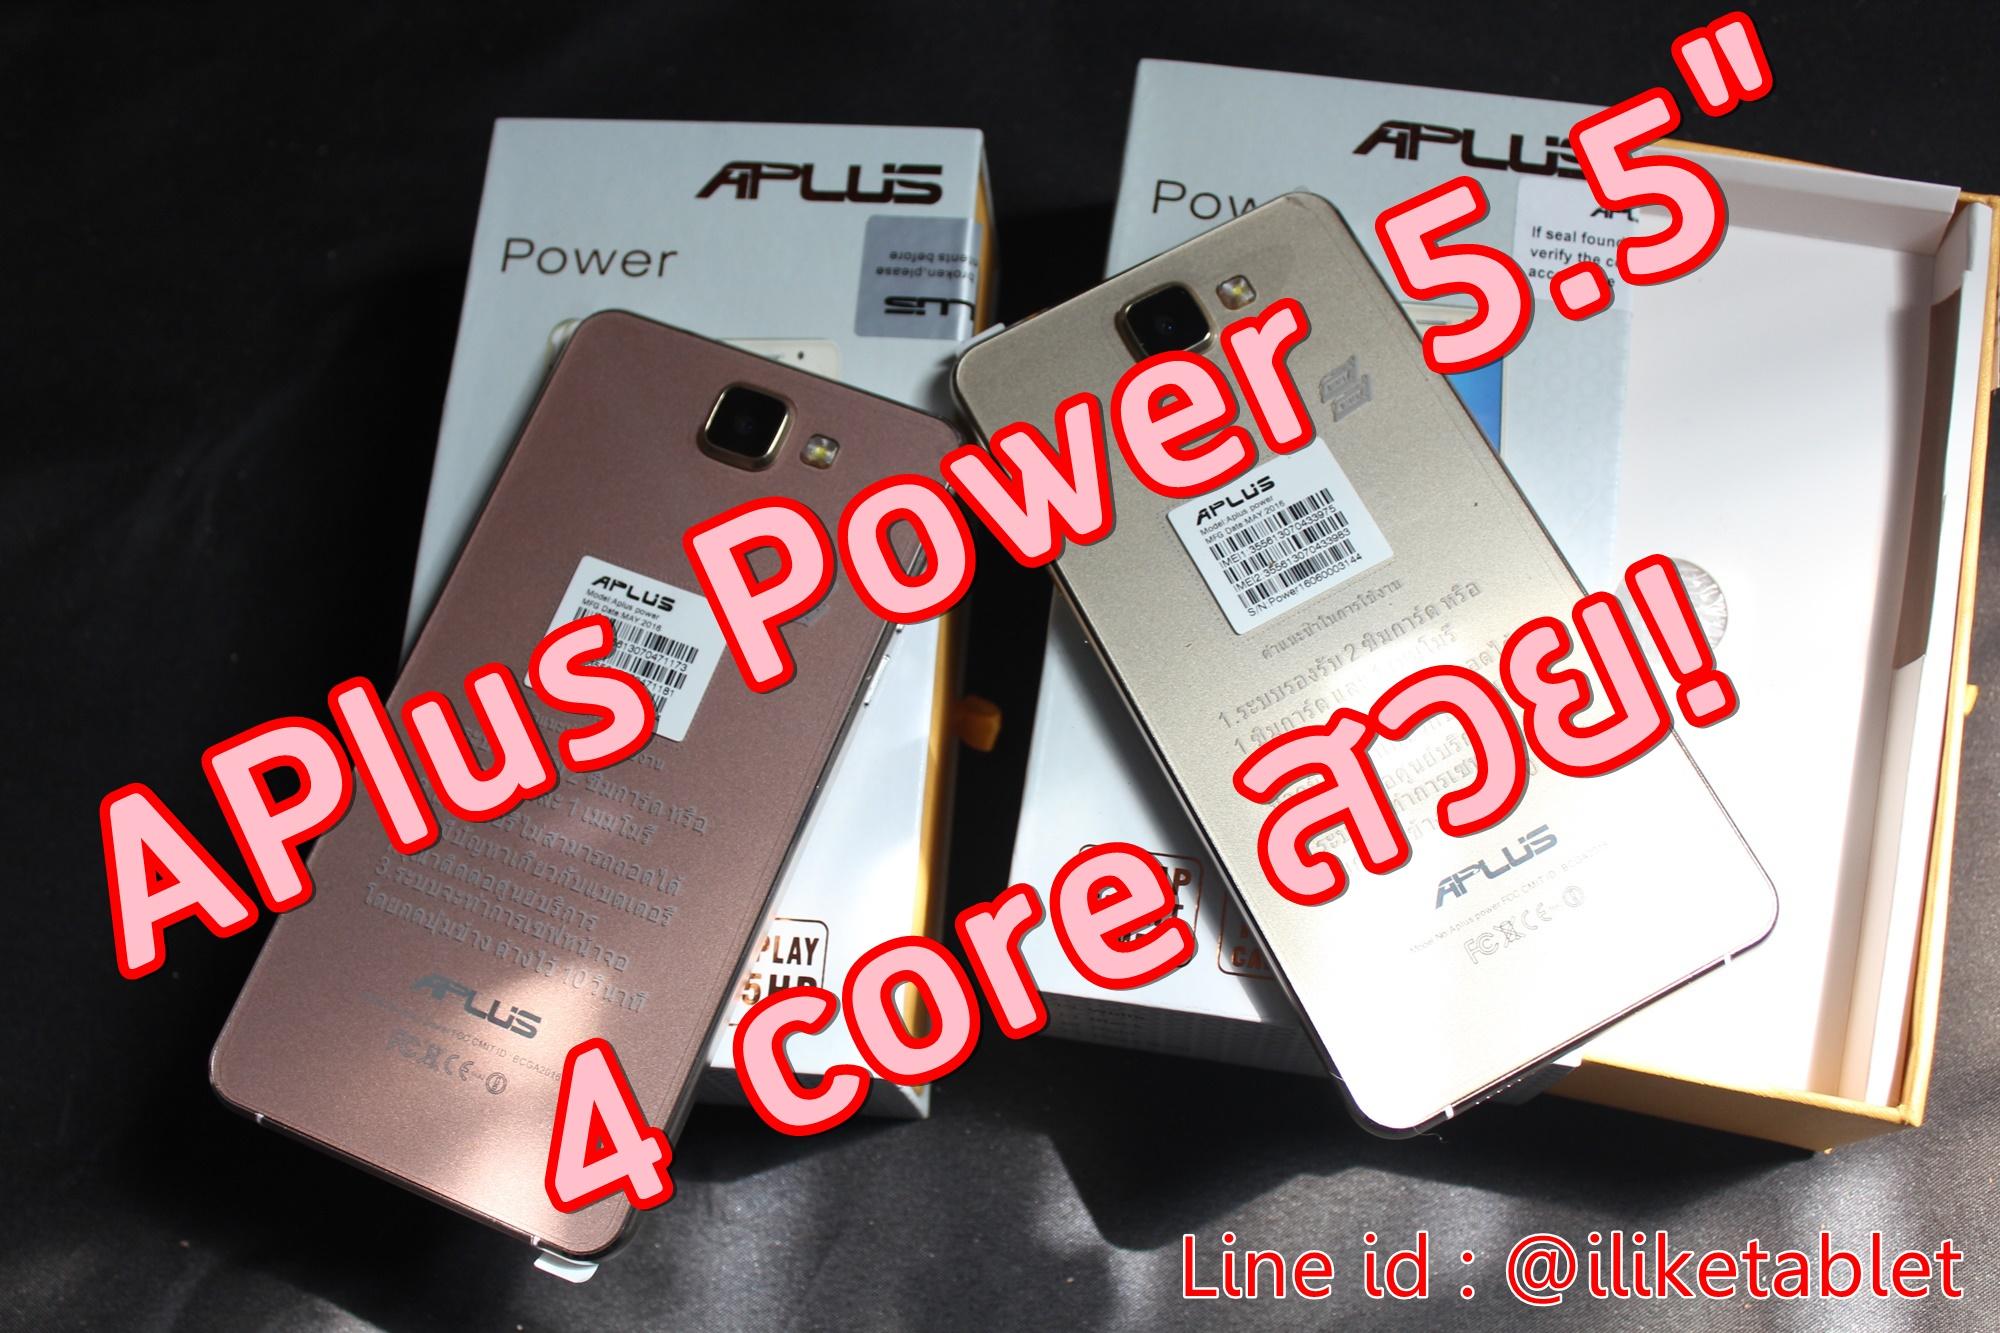 APLUS Power (A7) 4 core จอใหญ่ 5.5 นิ้ว กล้อง 8 ล้าน 2 ซิม กล้องชัด